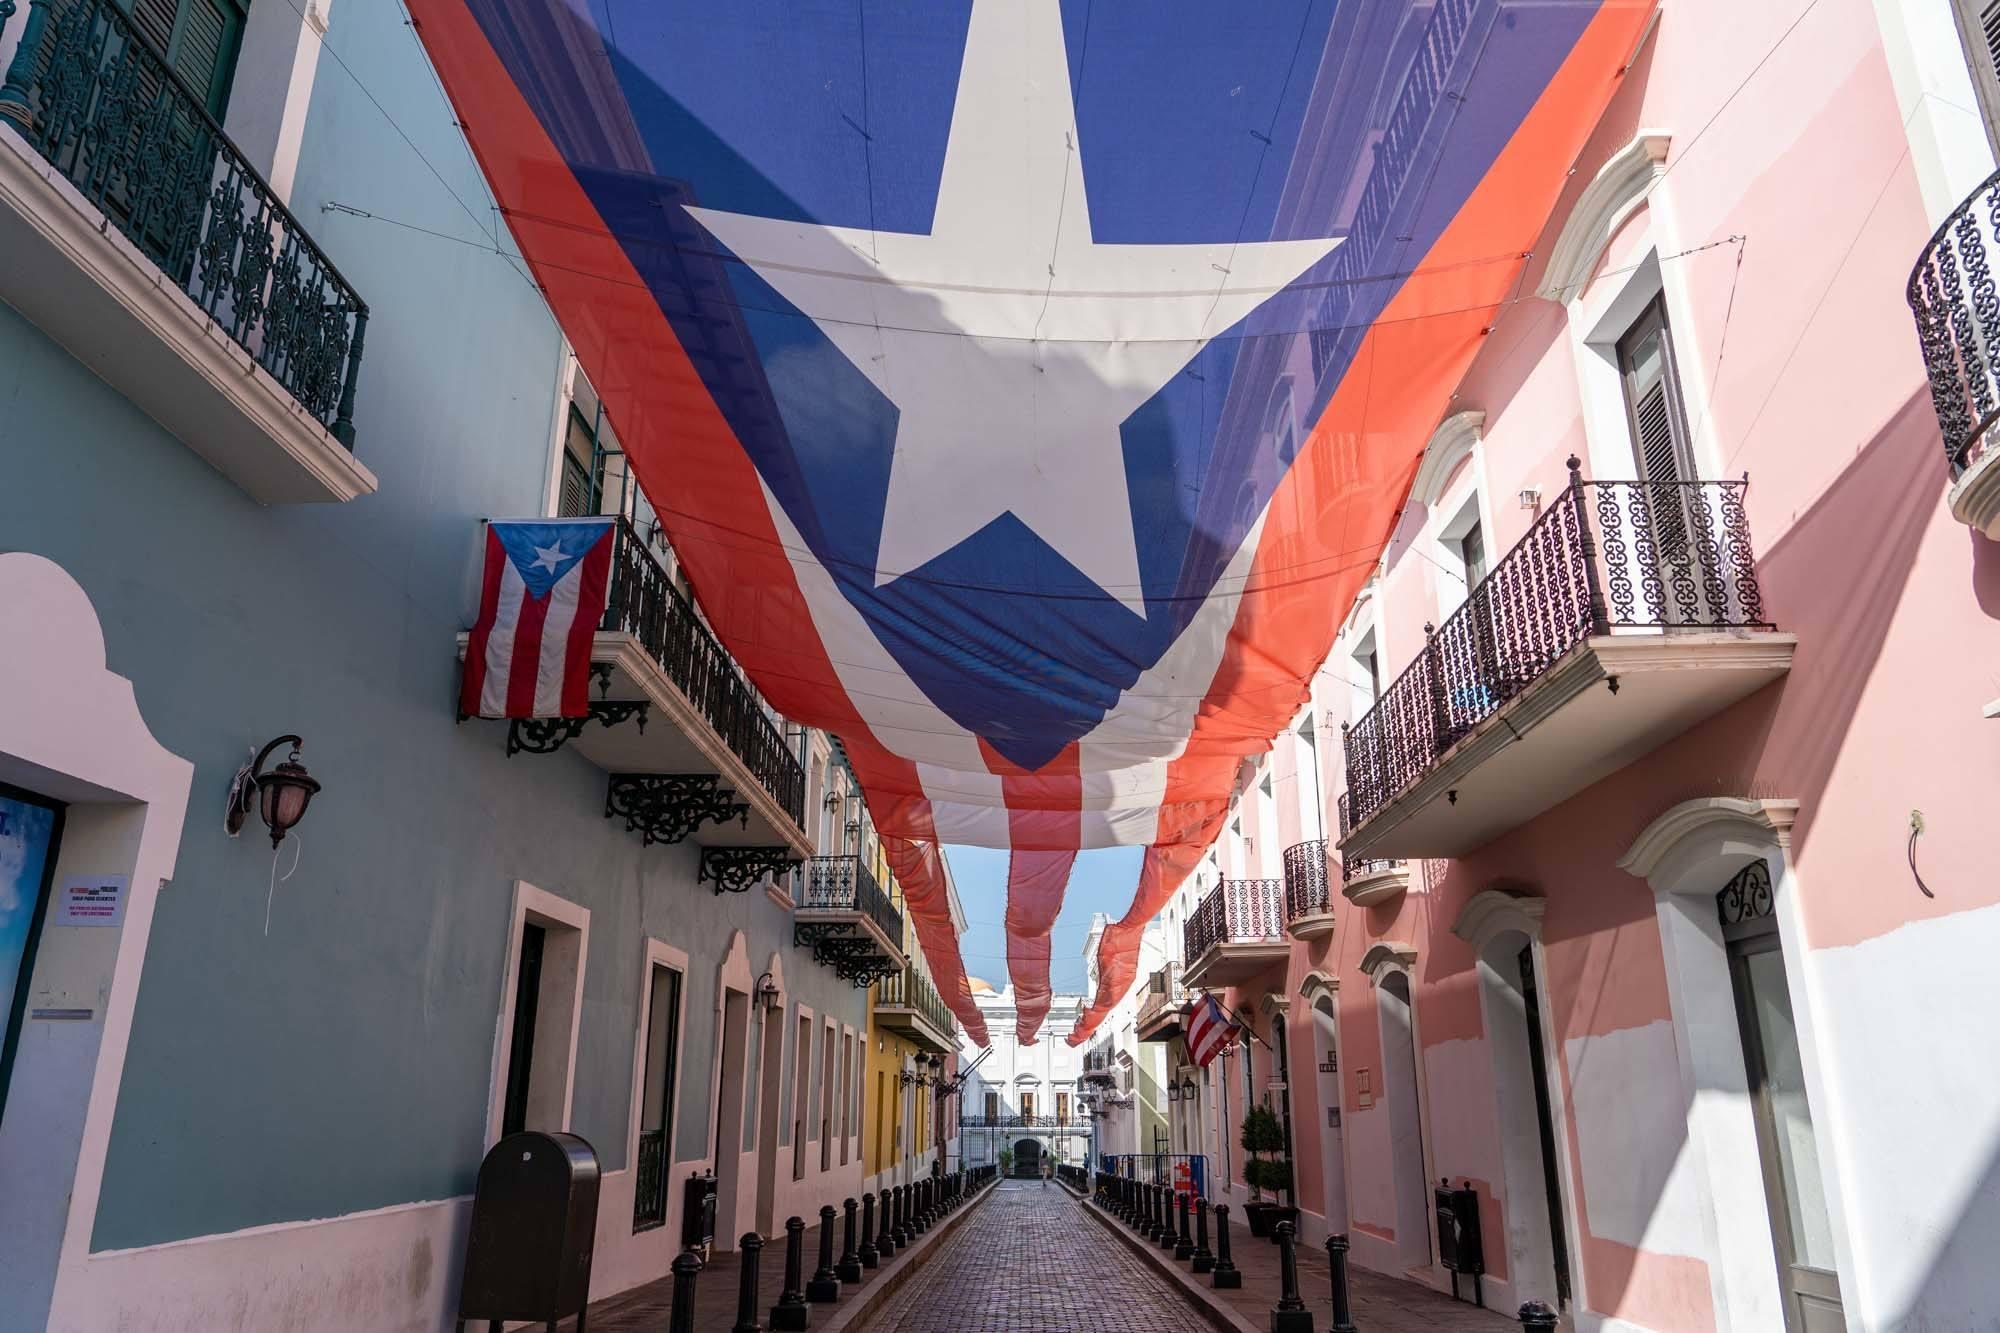 Calle Fortaleza, Old San Juan